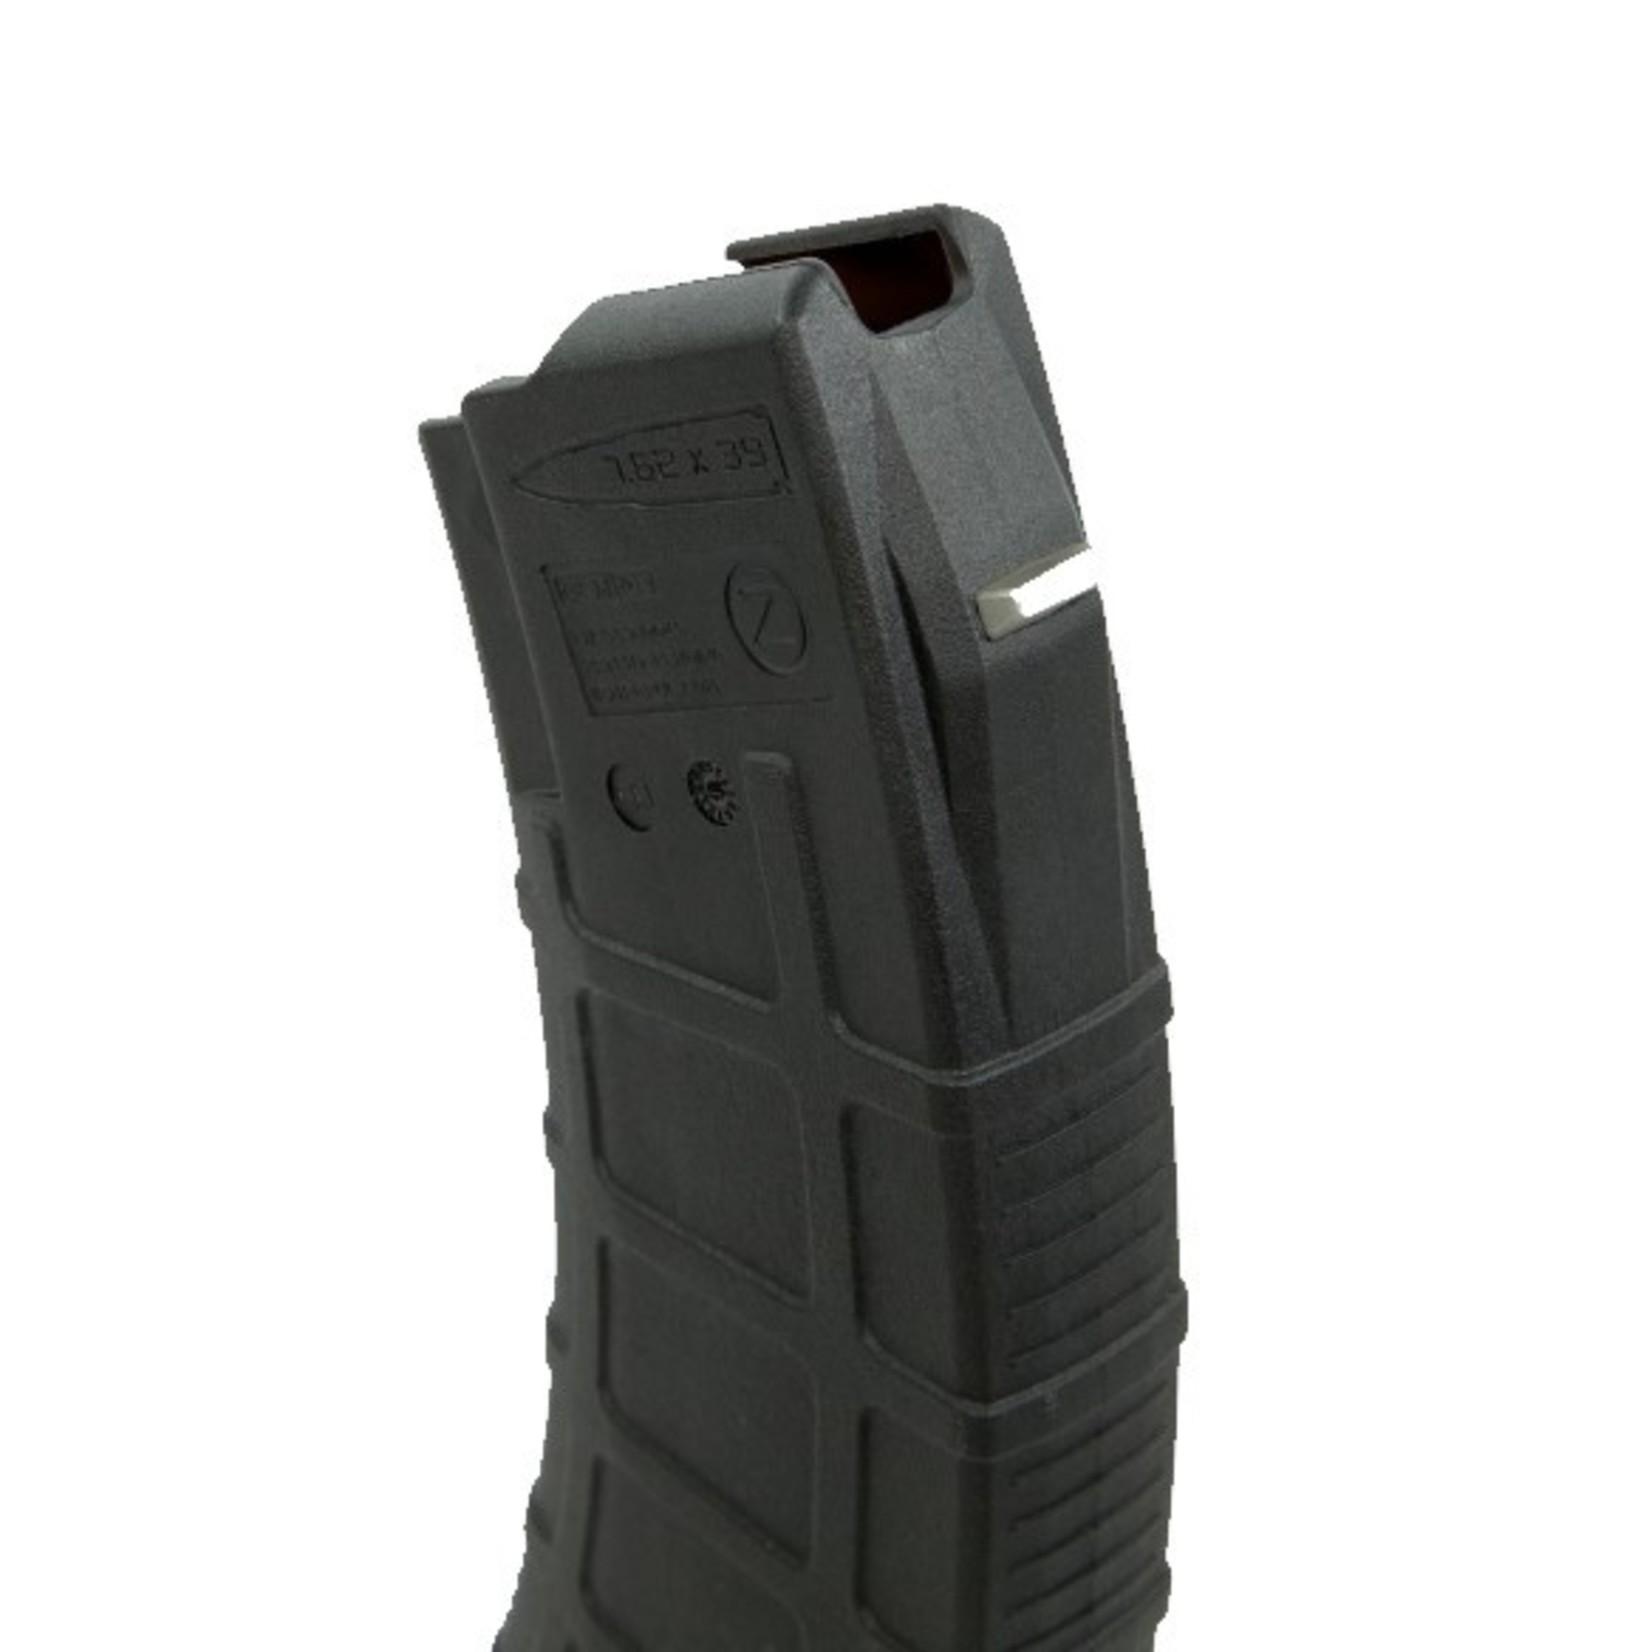 MAGPUL PMAG 30 AK/AKM GEN M3 (PINNED TO 5)